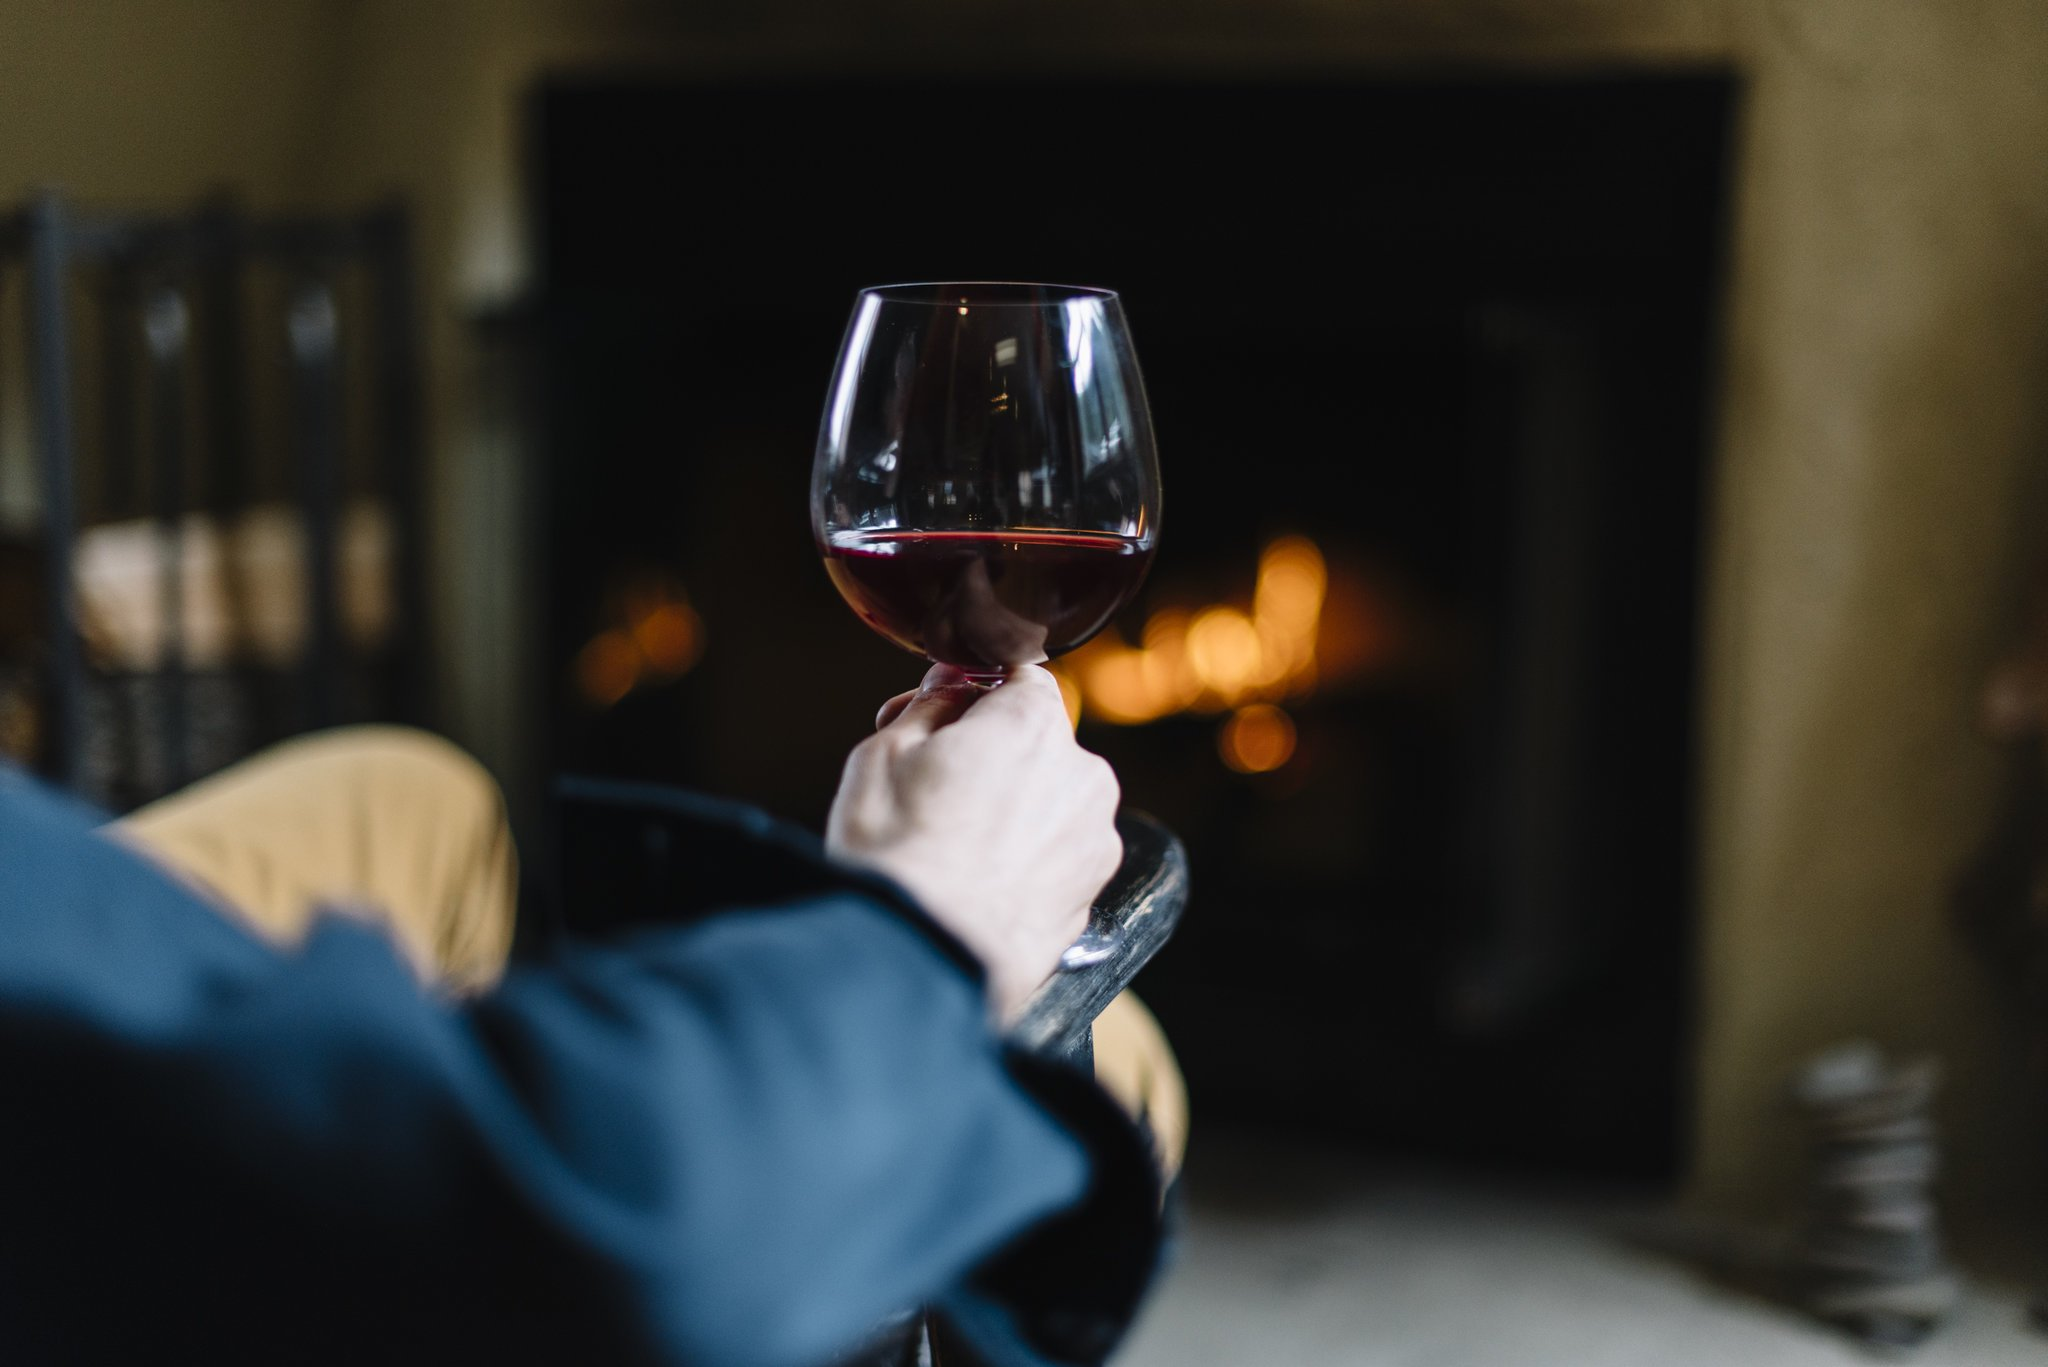 Unbreakable Red Wine/Pinot Noir glasses - 100% Tritan Dishwasher-safe, shatterproof plastic wine glasses - Smooth Rims -Set of 4 (22oz Stemmed Red) by TaZa